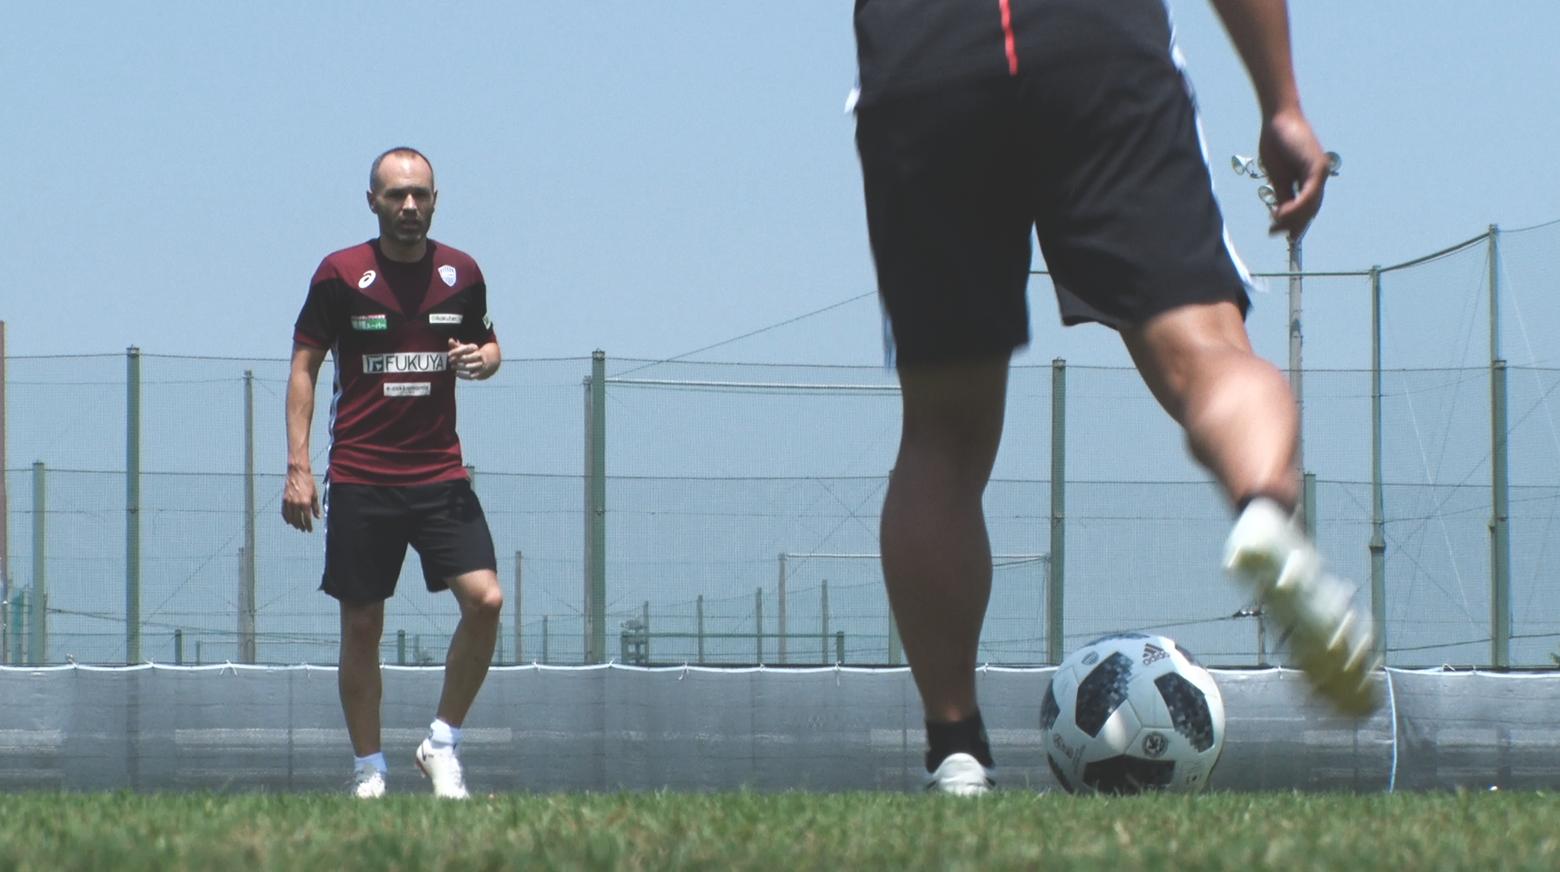 Iniesta TV Episode 12: Road to Kobe #10 First Individual Practice